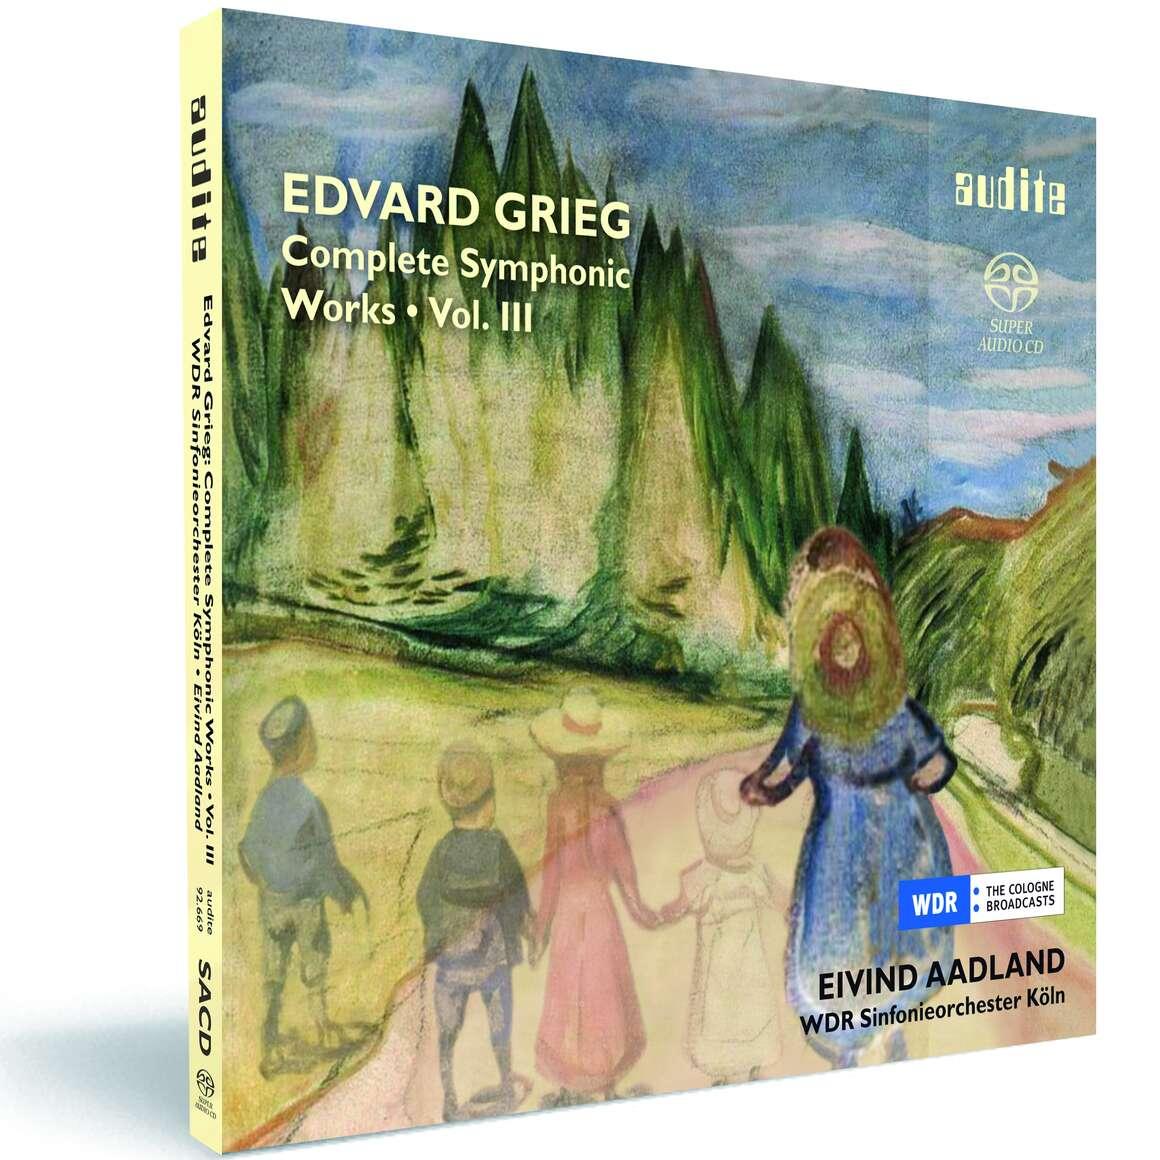 E. Grieg: Complete Symphonic Works Vol. III